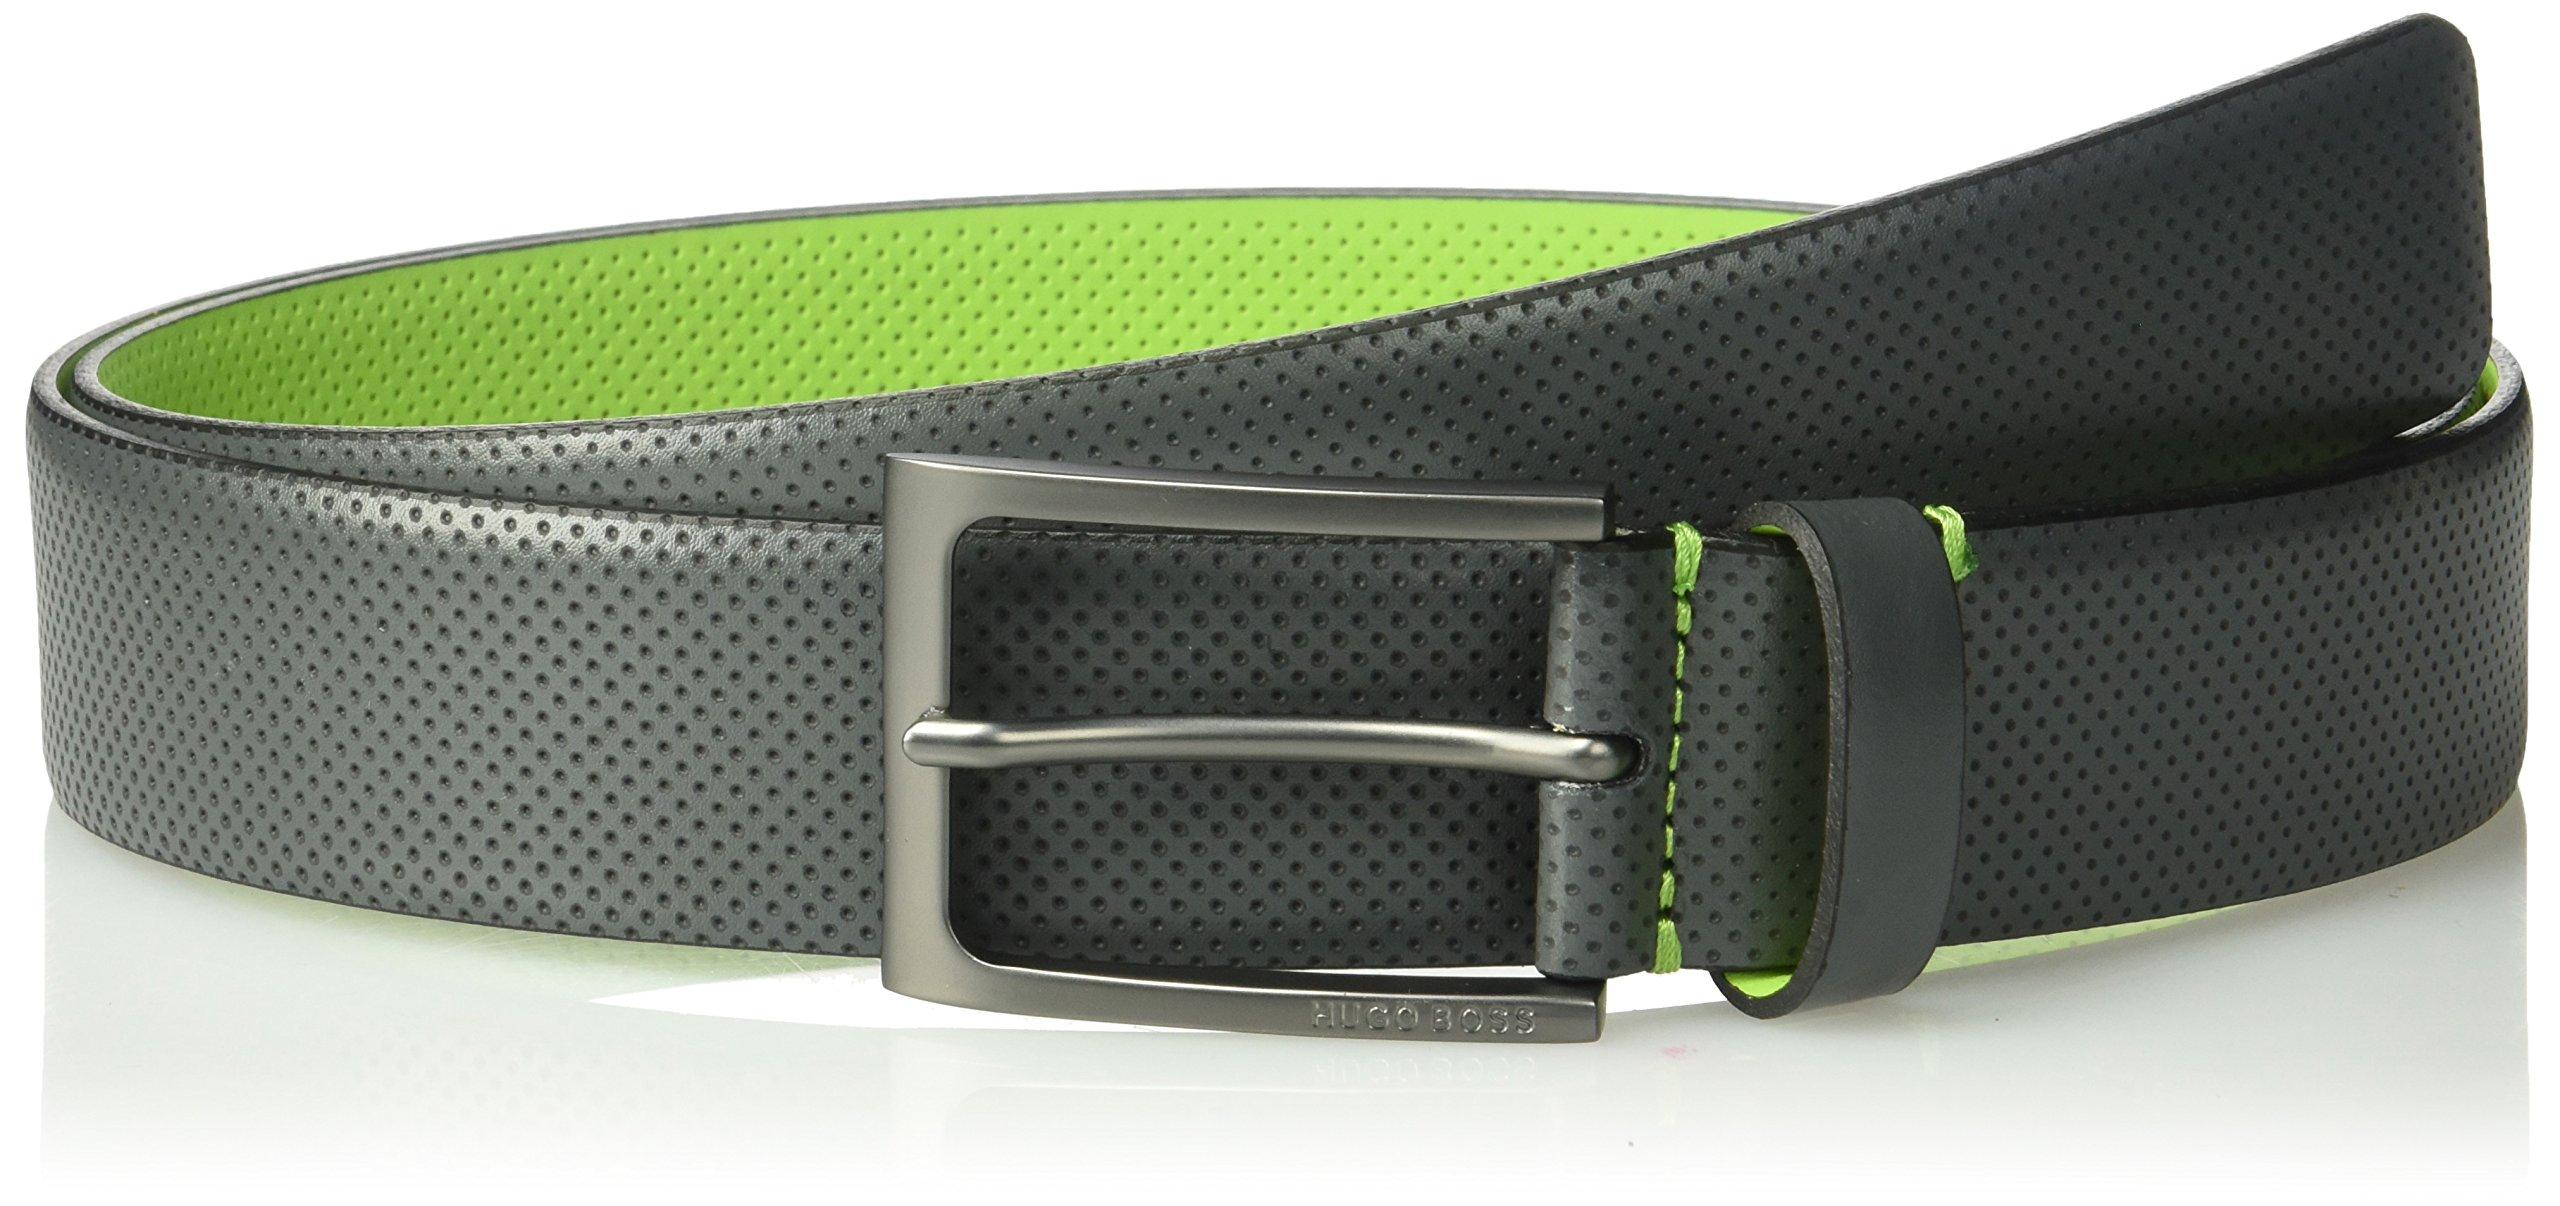 Boss Hugo Boss Men's Ticolor Printed Leather Belt, grey, 30 US - 80 EU